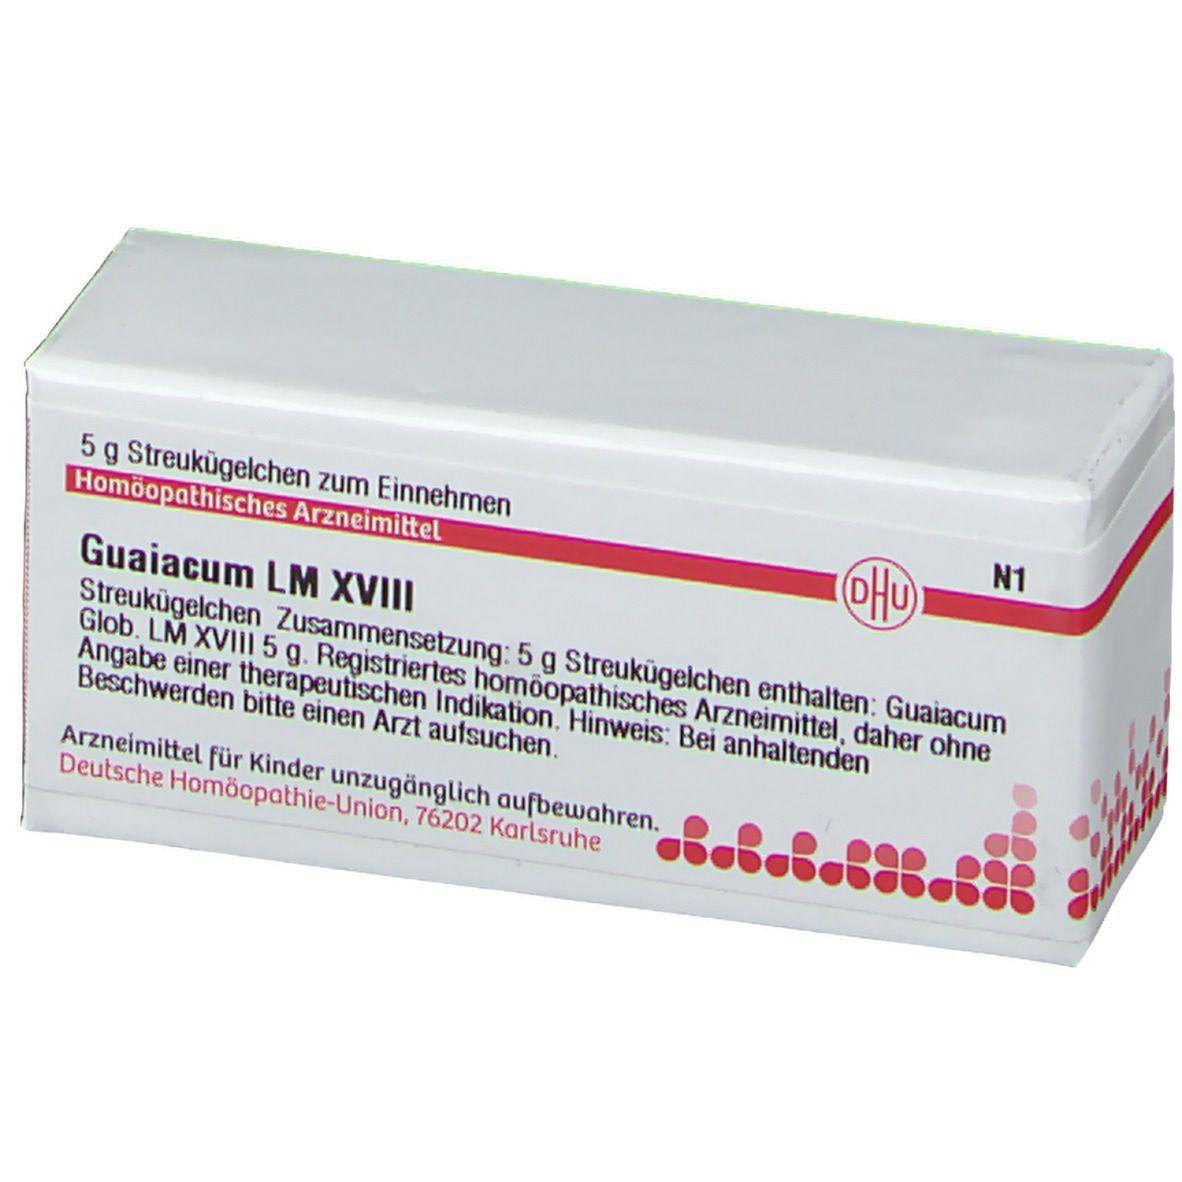 DHU Guaiacum LM XVIII